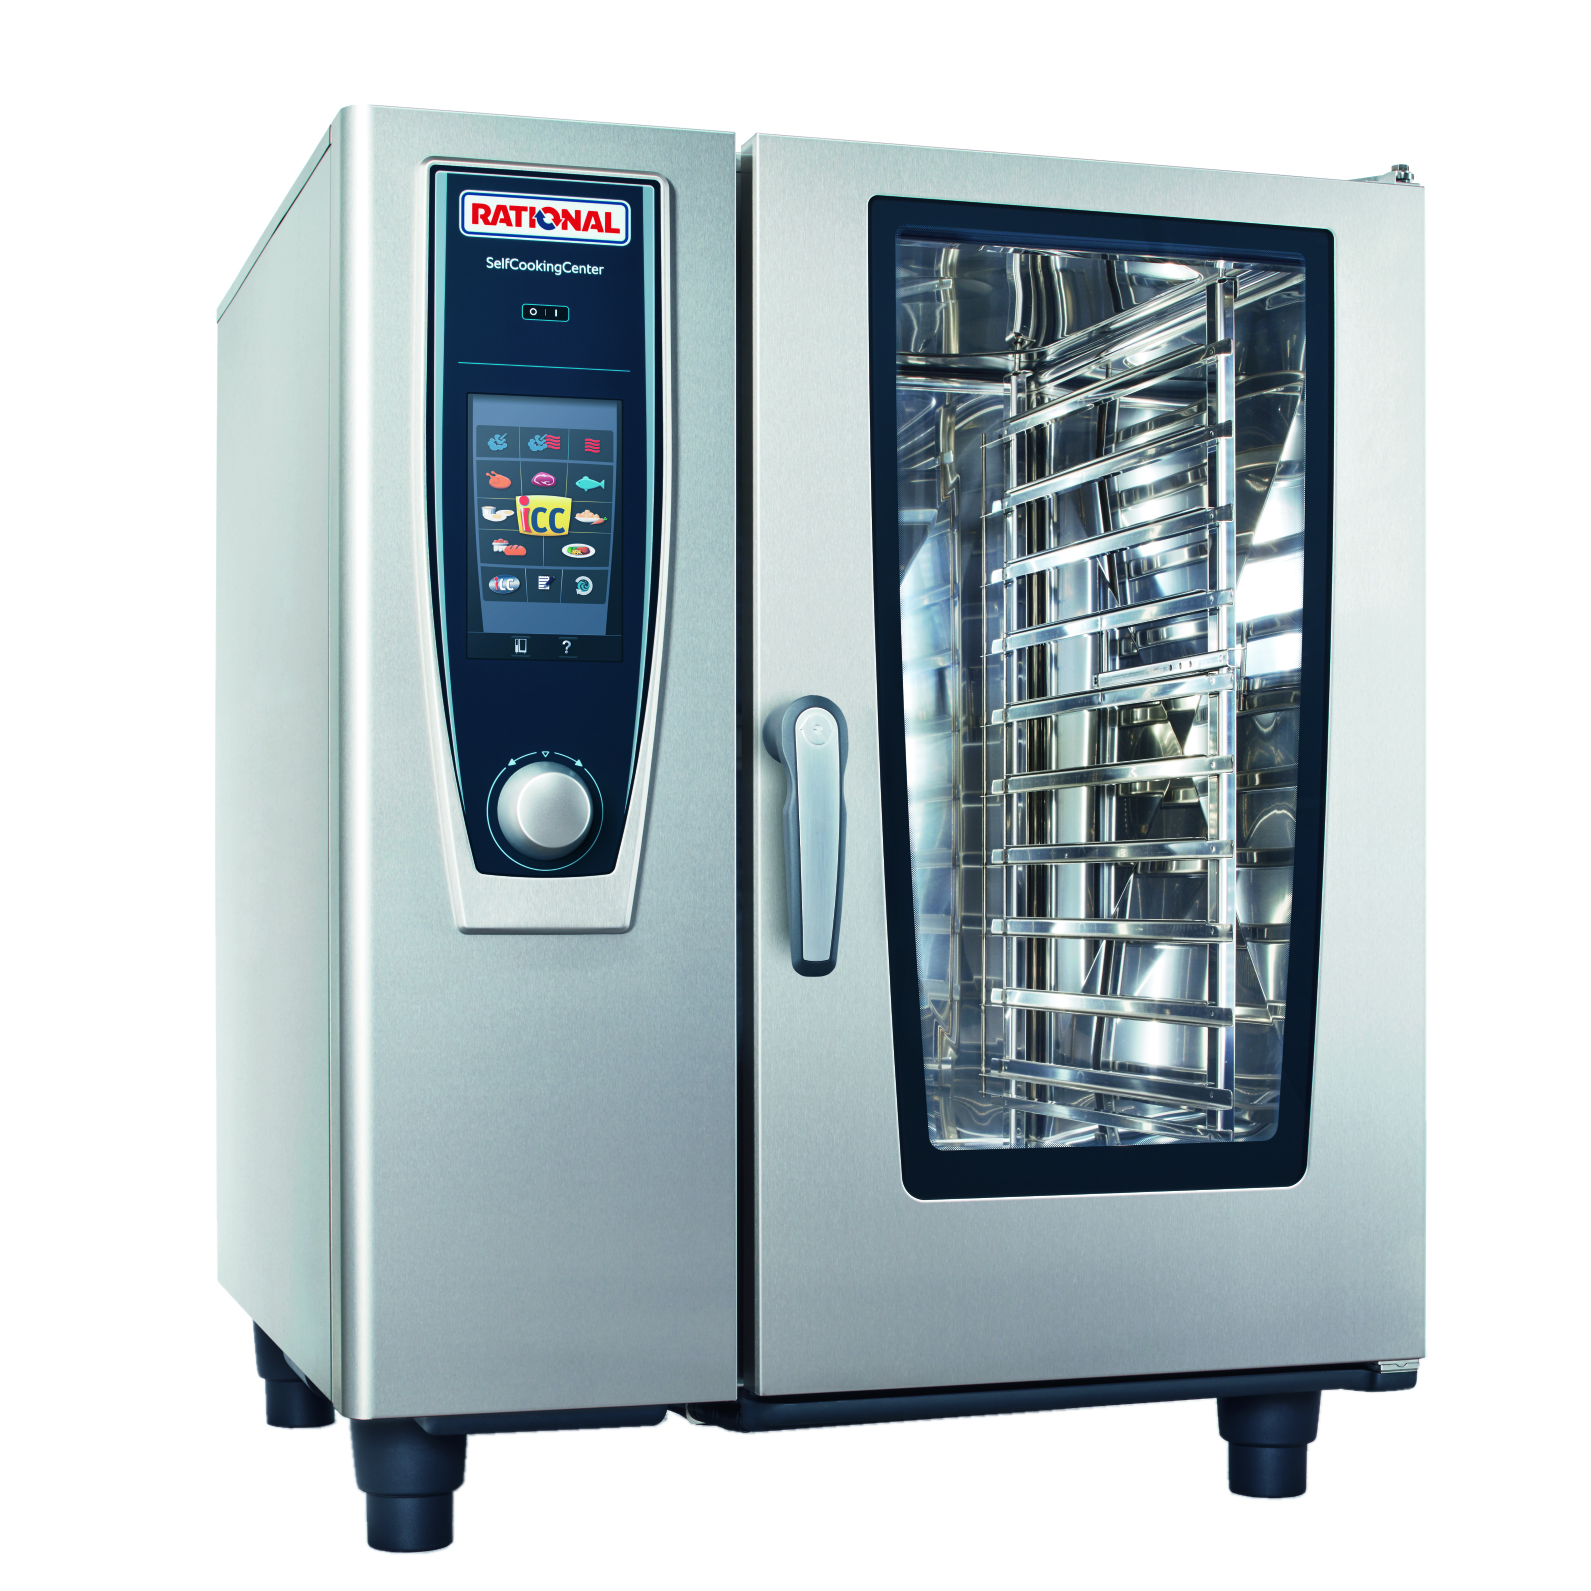 RATIONAL B118206.27D combi oven, gas